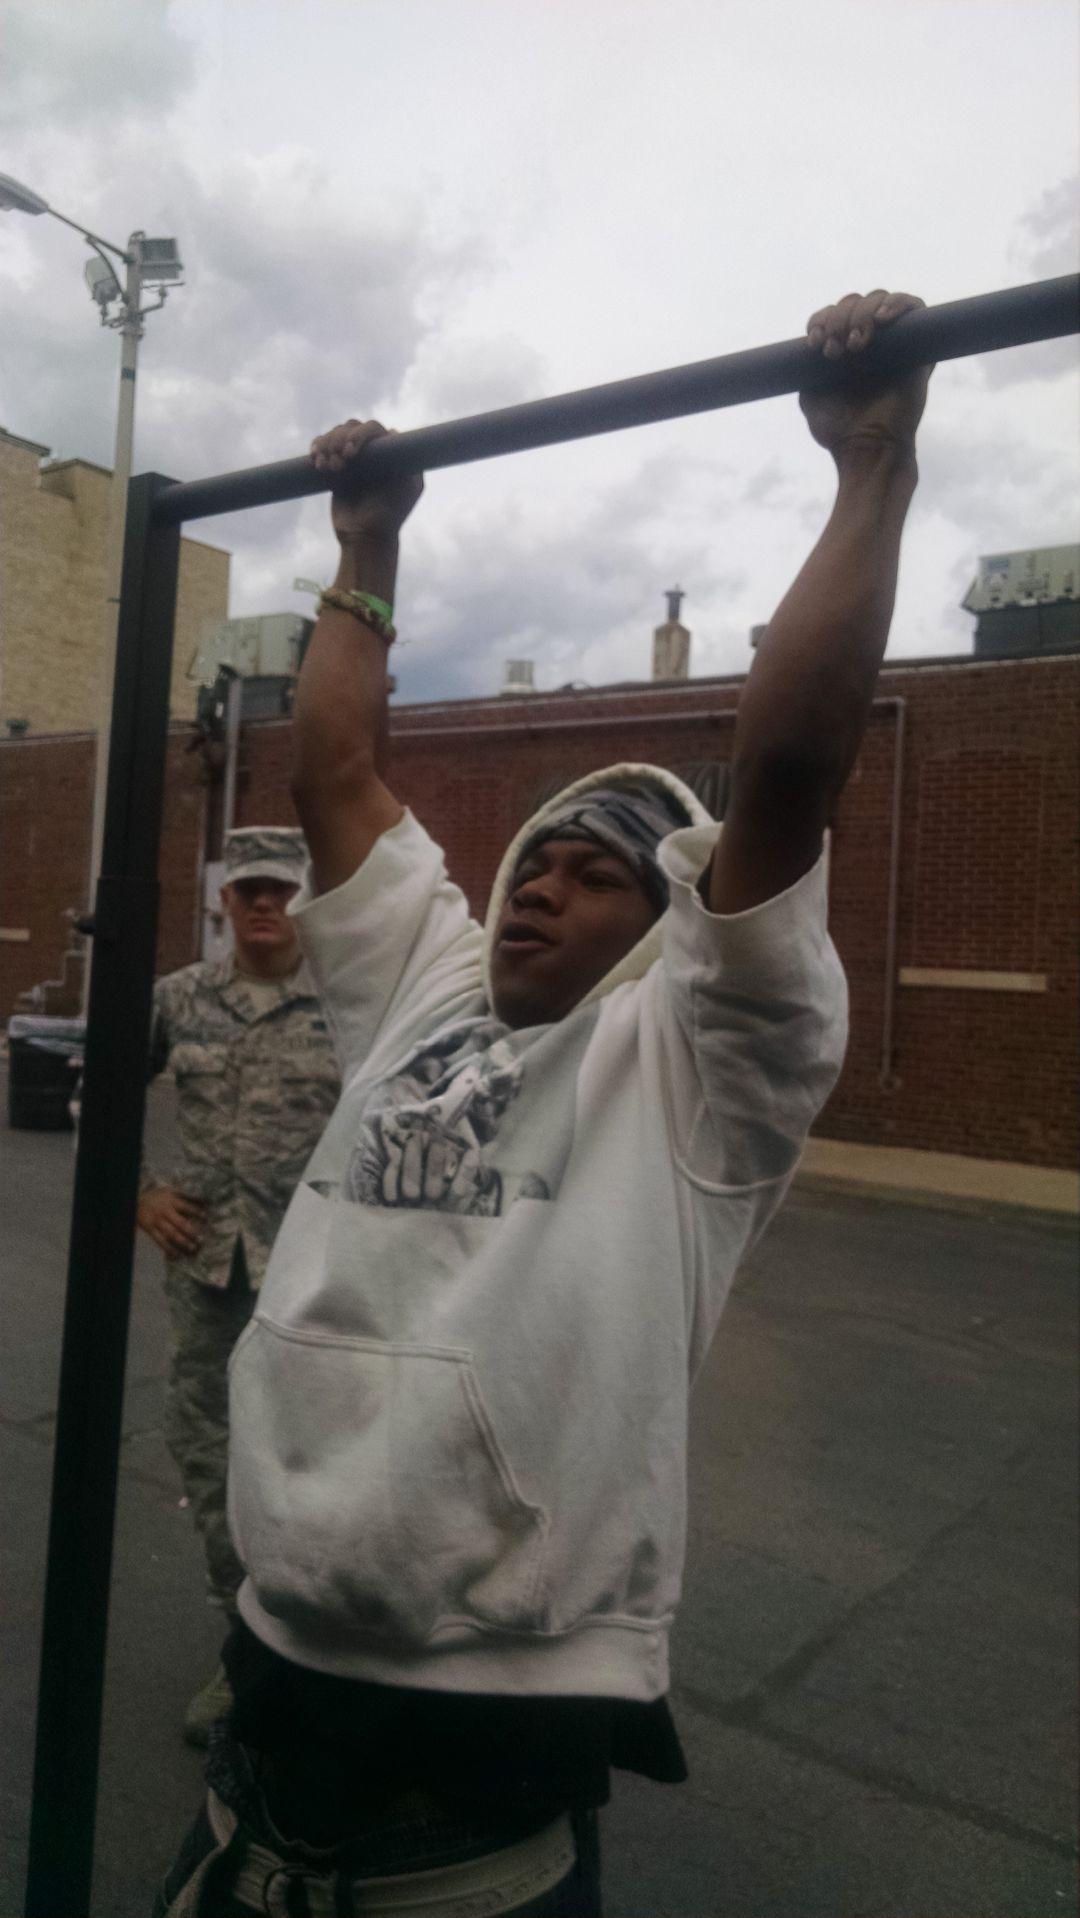 Air Force pull-up bar